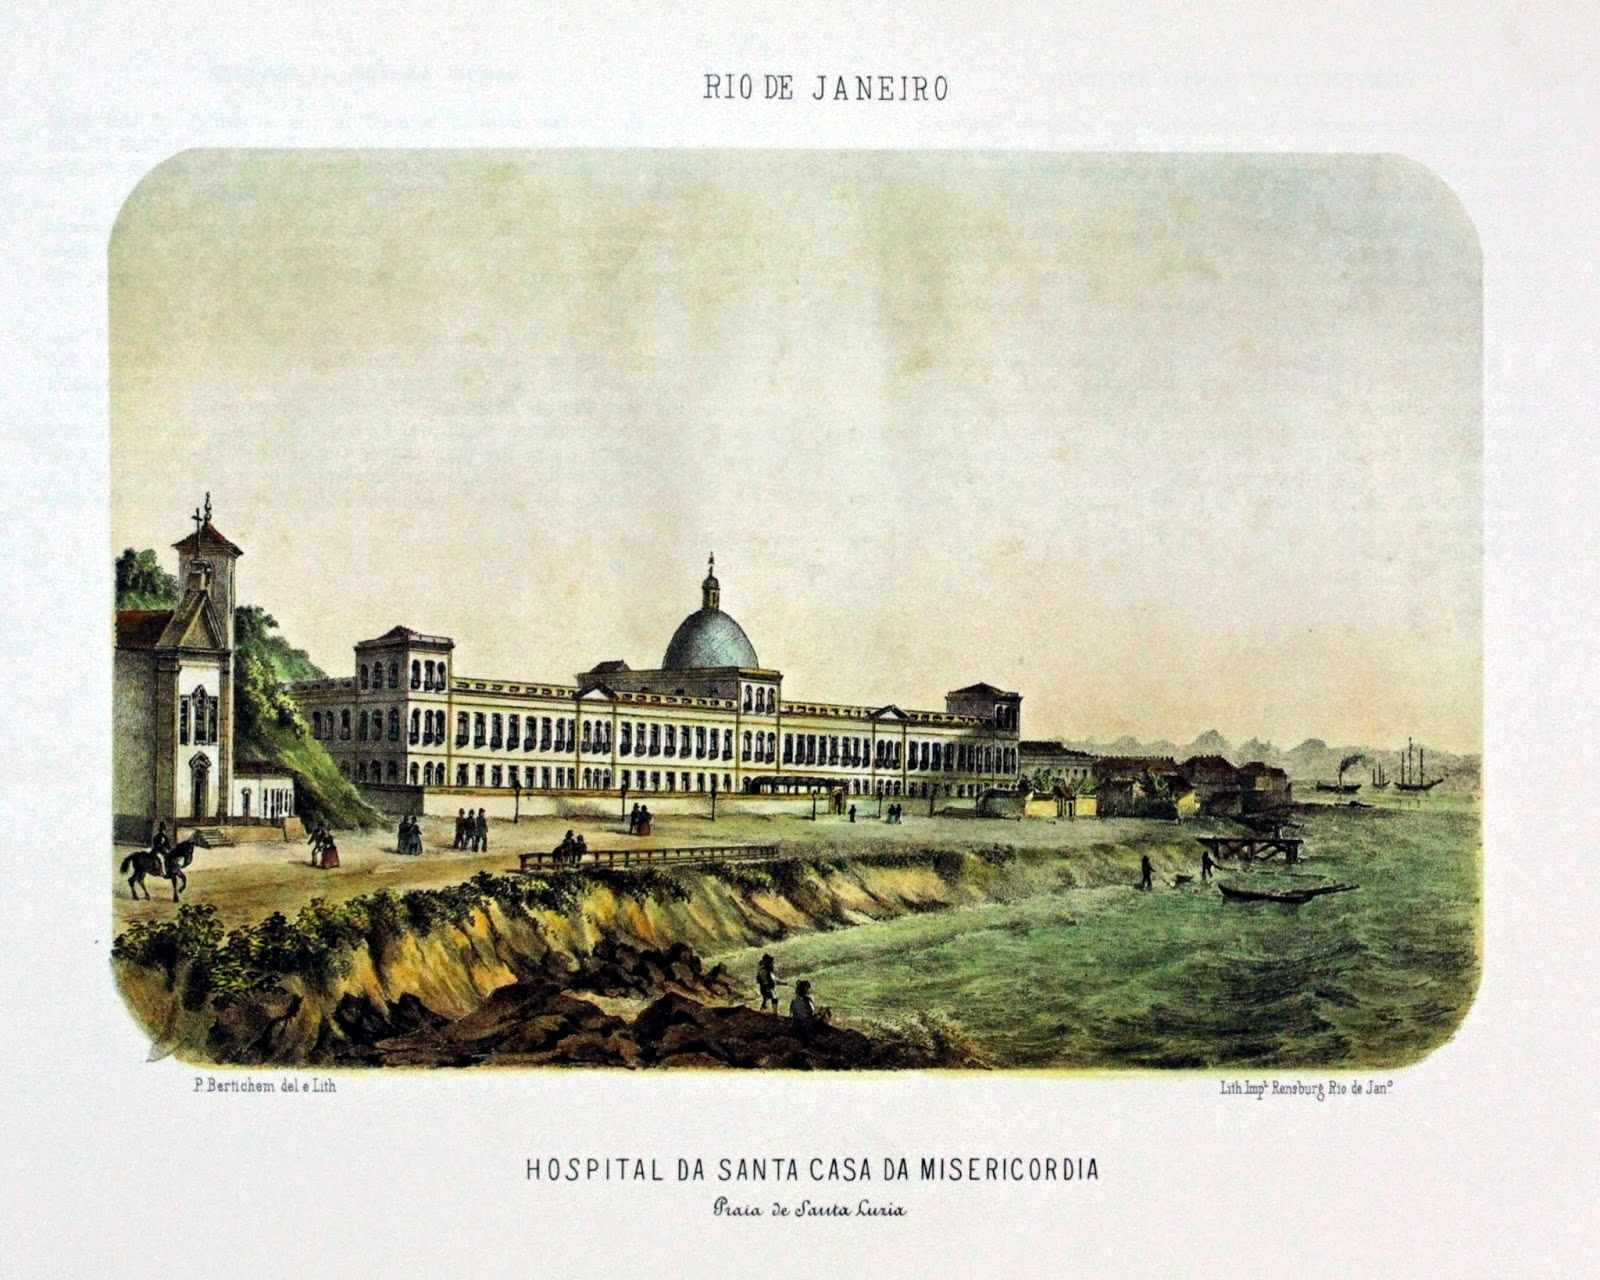 Pintura de  Pieter Godfred Bertichem, 1856. Santa Casa. Na praia, vê-se, à esquerda, a Igreja de Santa Luzia.  http://historiasemonumentos.blogspot.com.br/2014/10/santa-casa-da-misericordia-do-rio.html